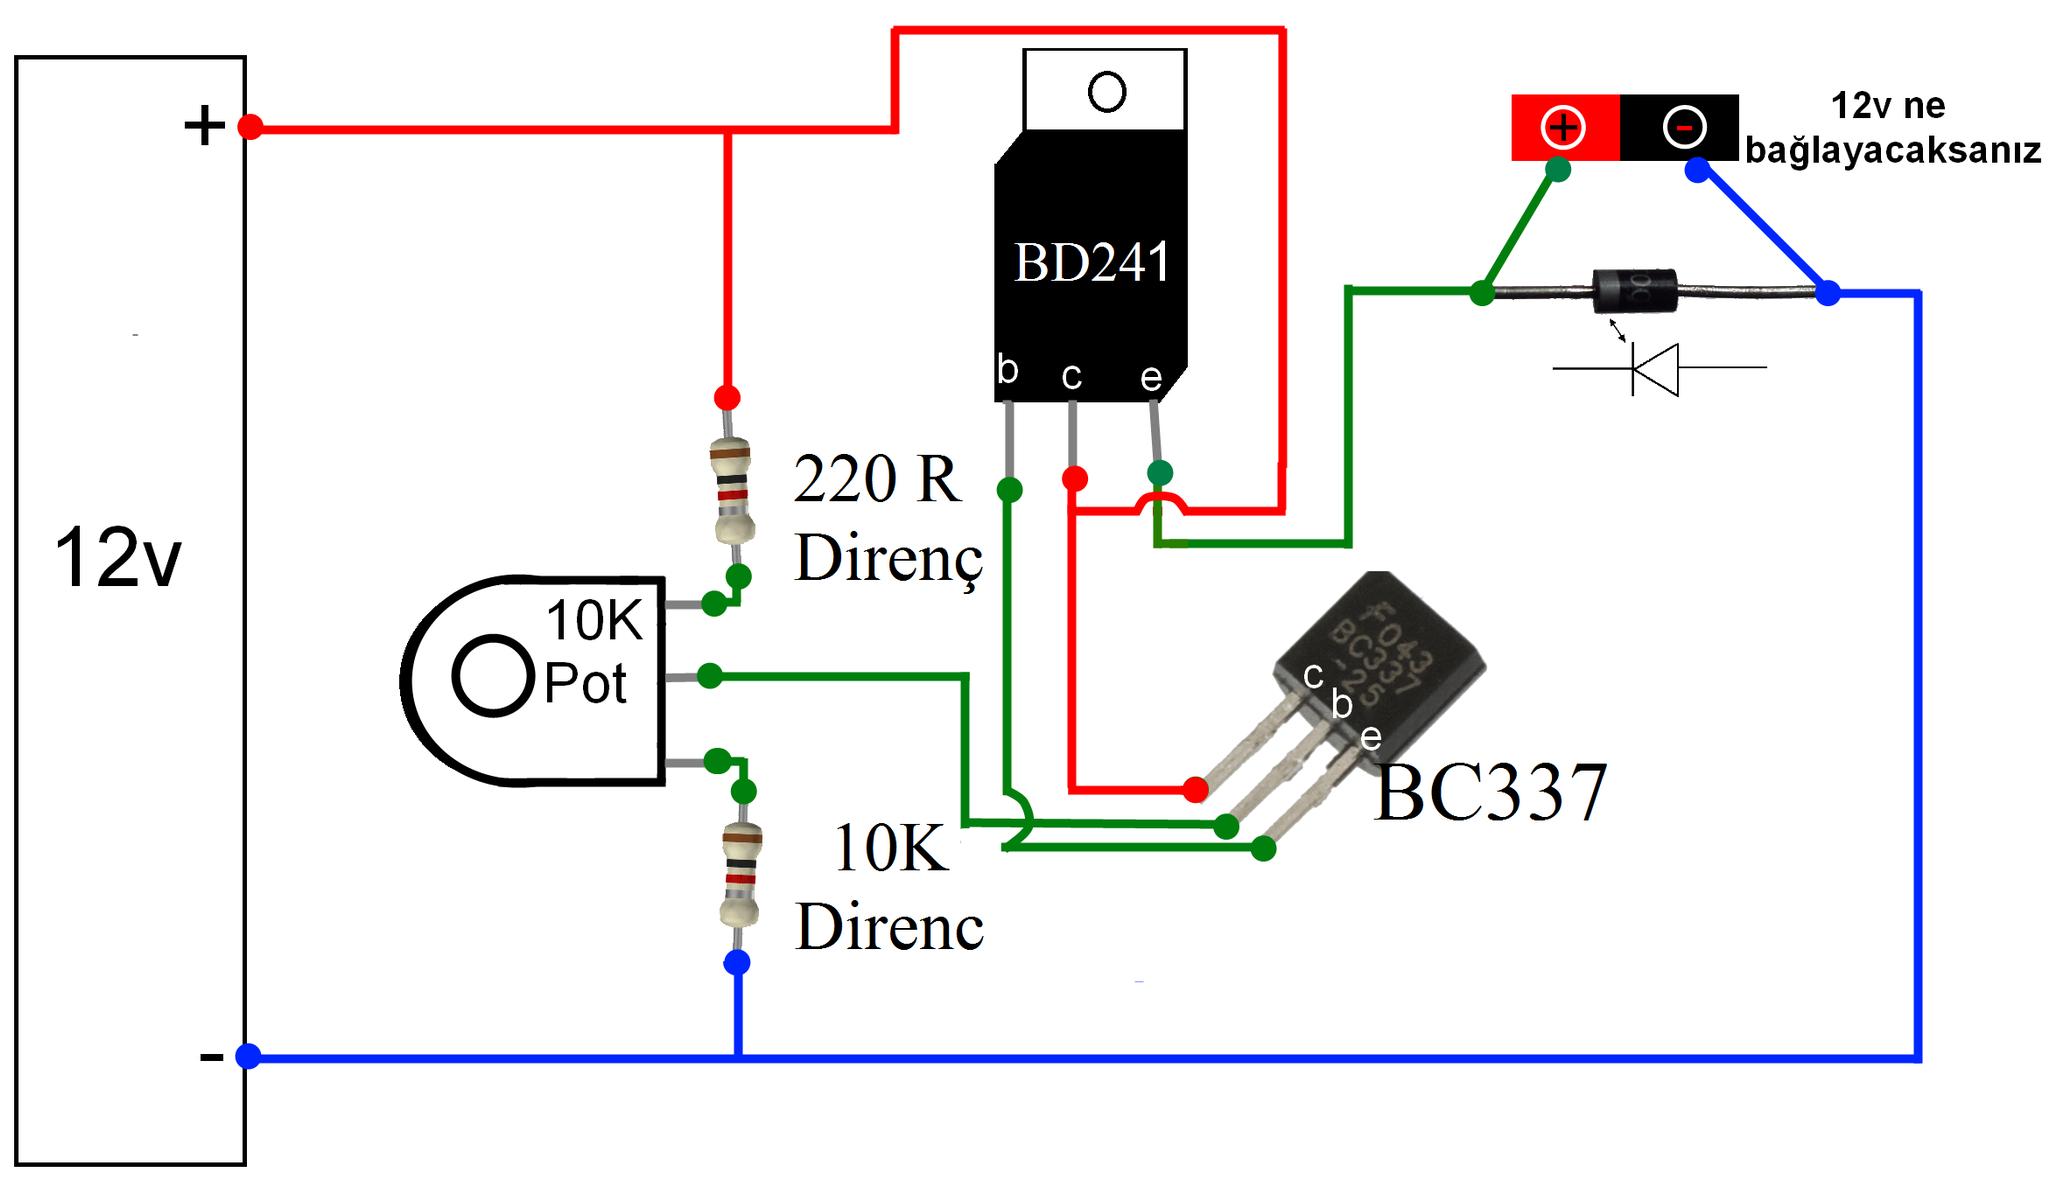 Radio Shack Potentiometer Wiring   Wiring Diagram - Potentiometer Wiring Diagram